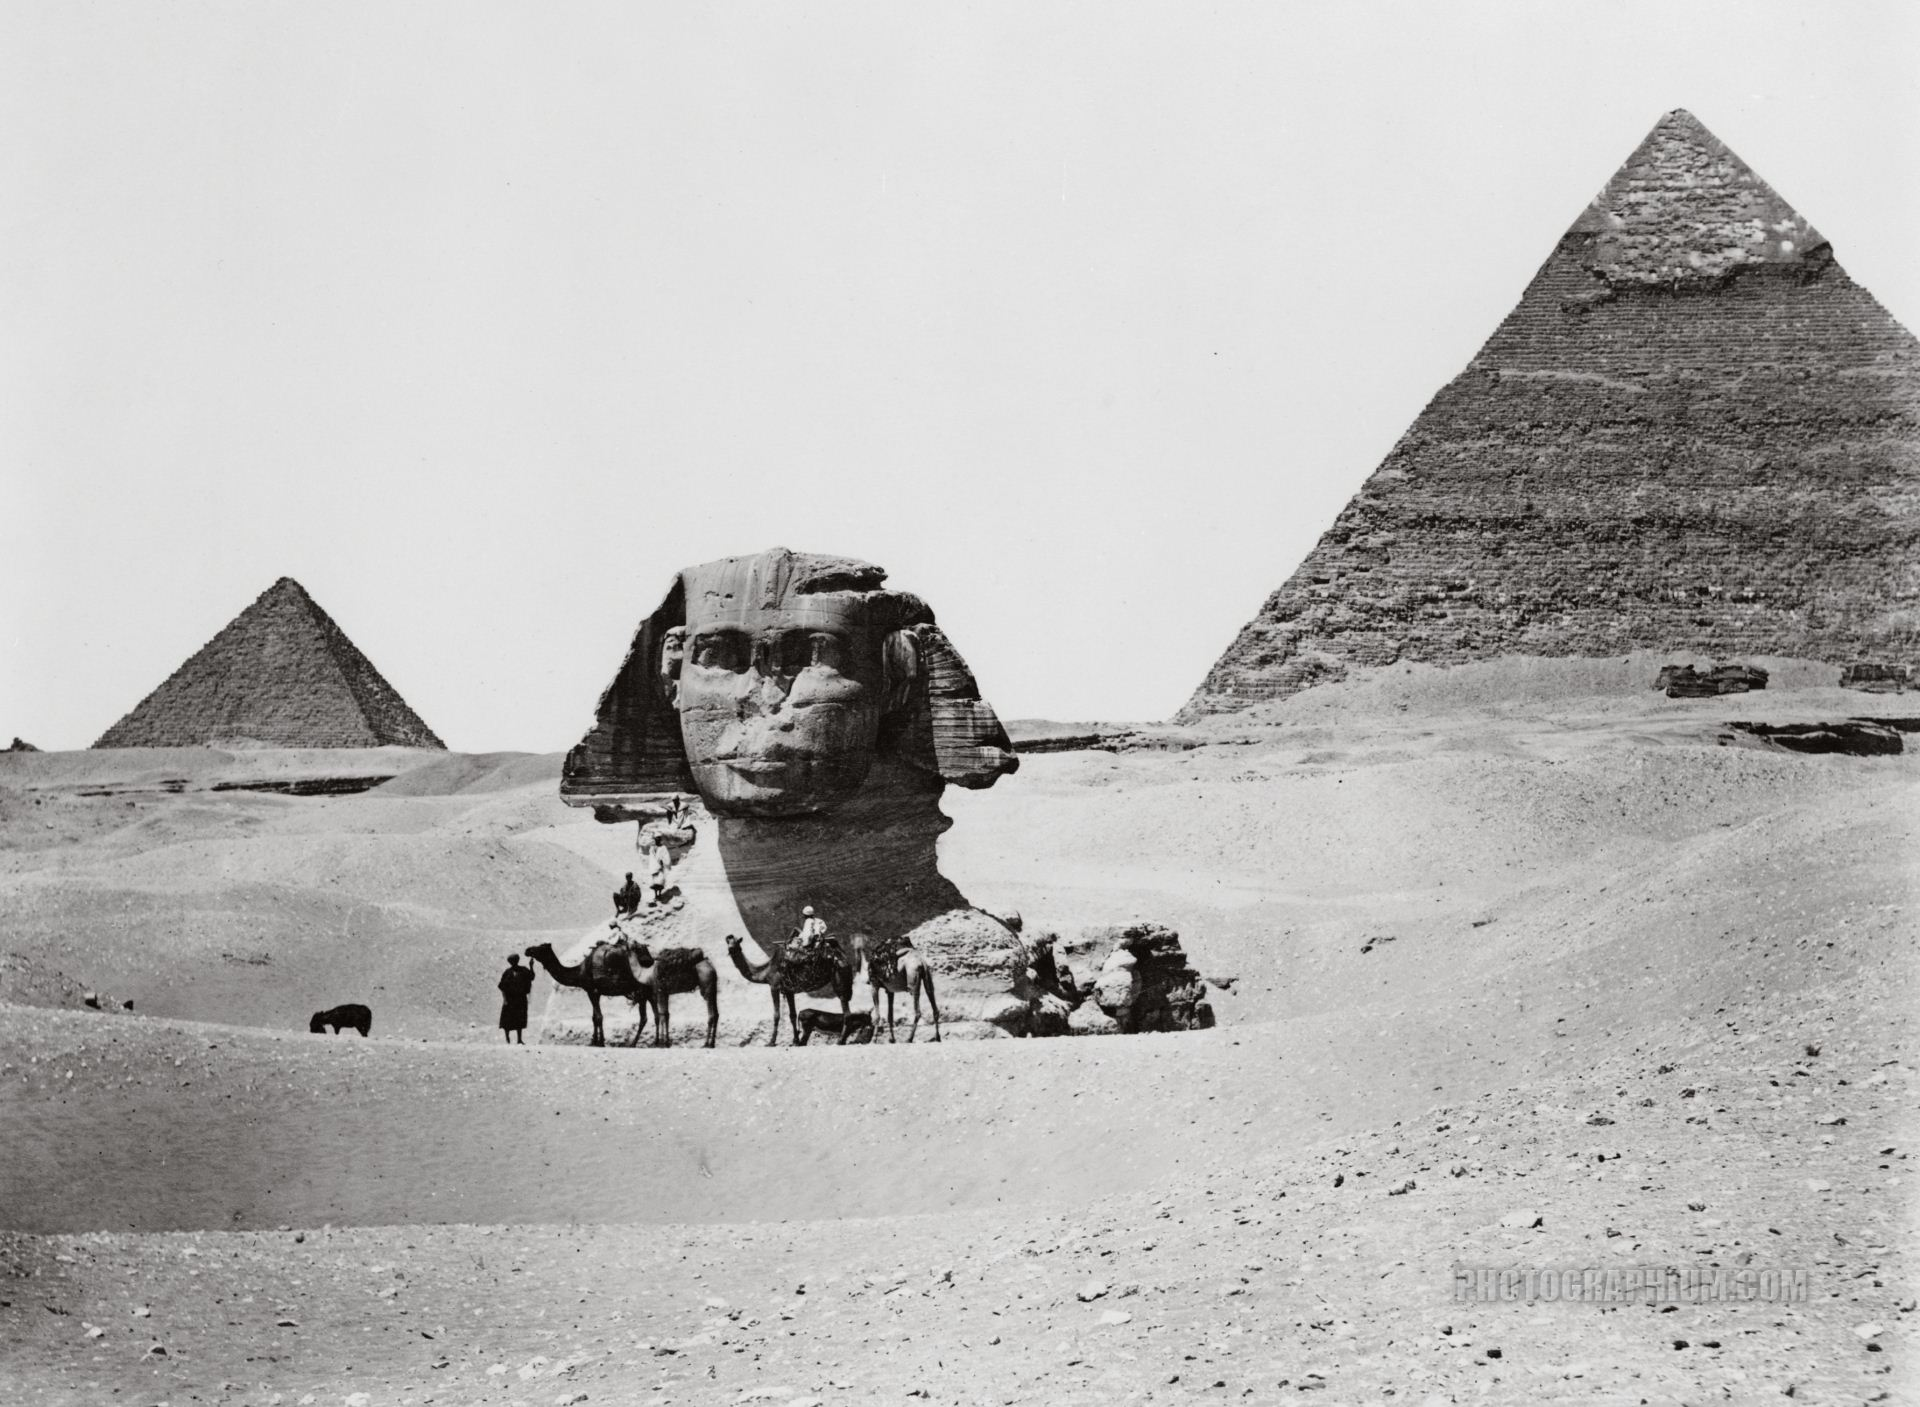 pyramids_and_sphinx__giza_egypt__1860-18